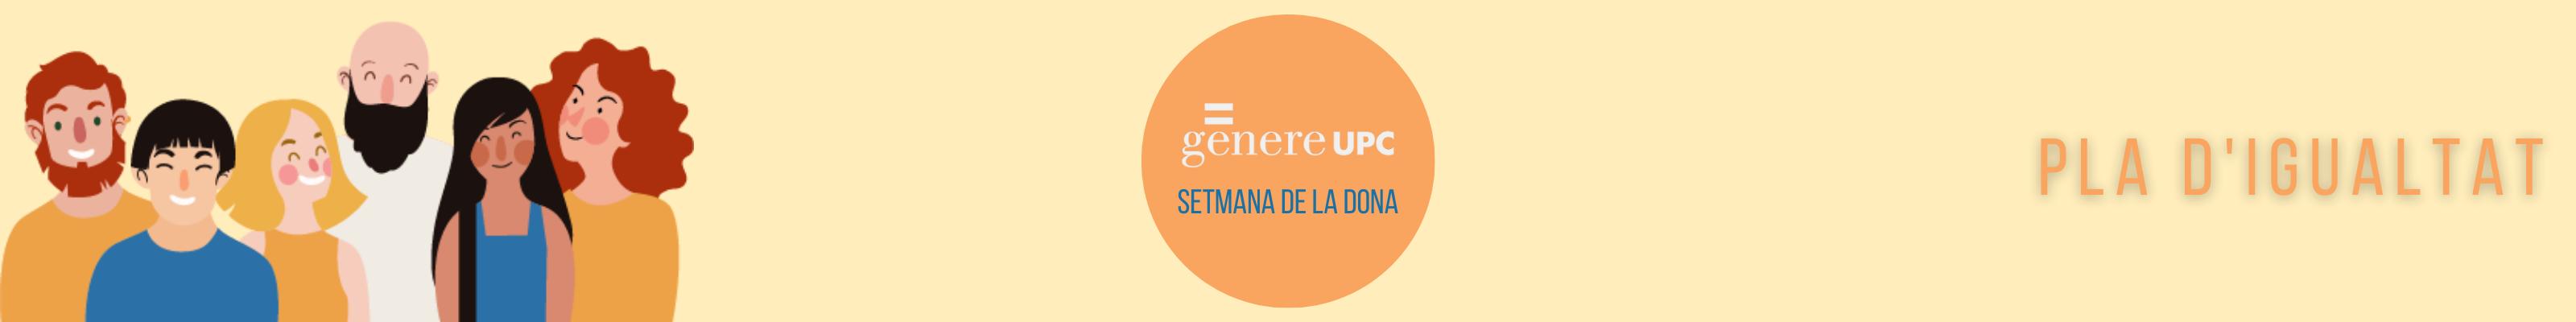 setmana-dona_pla-igualtat.png